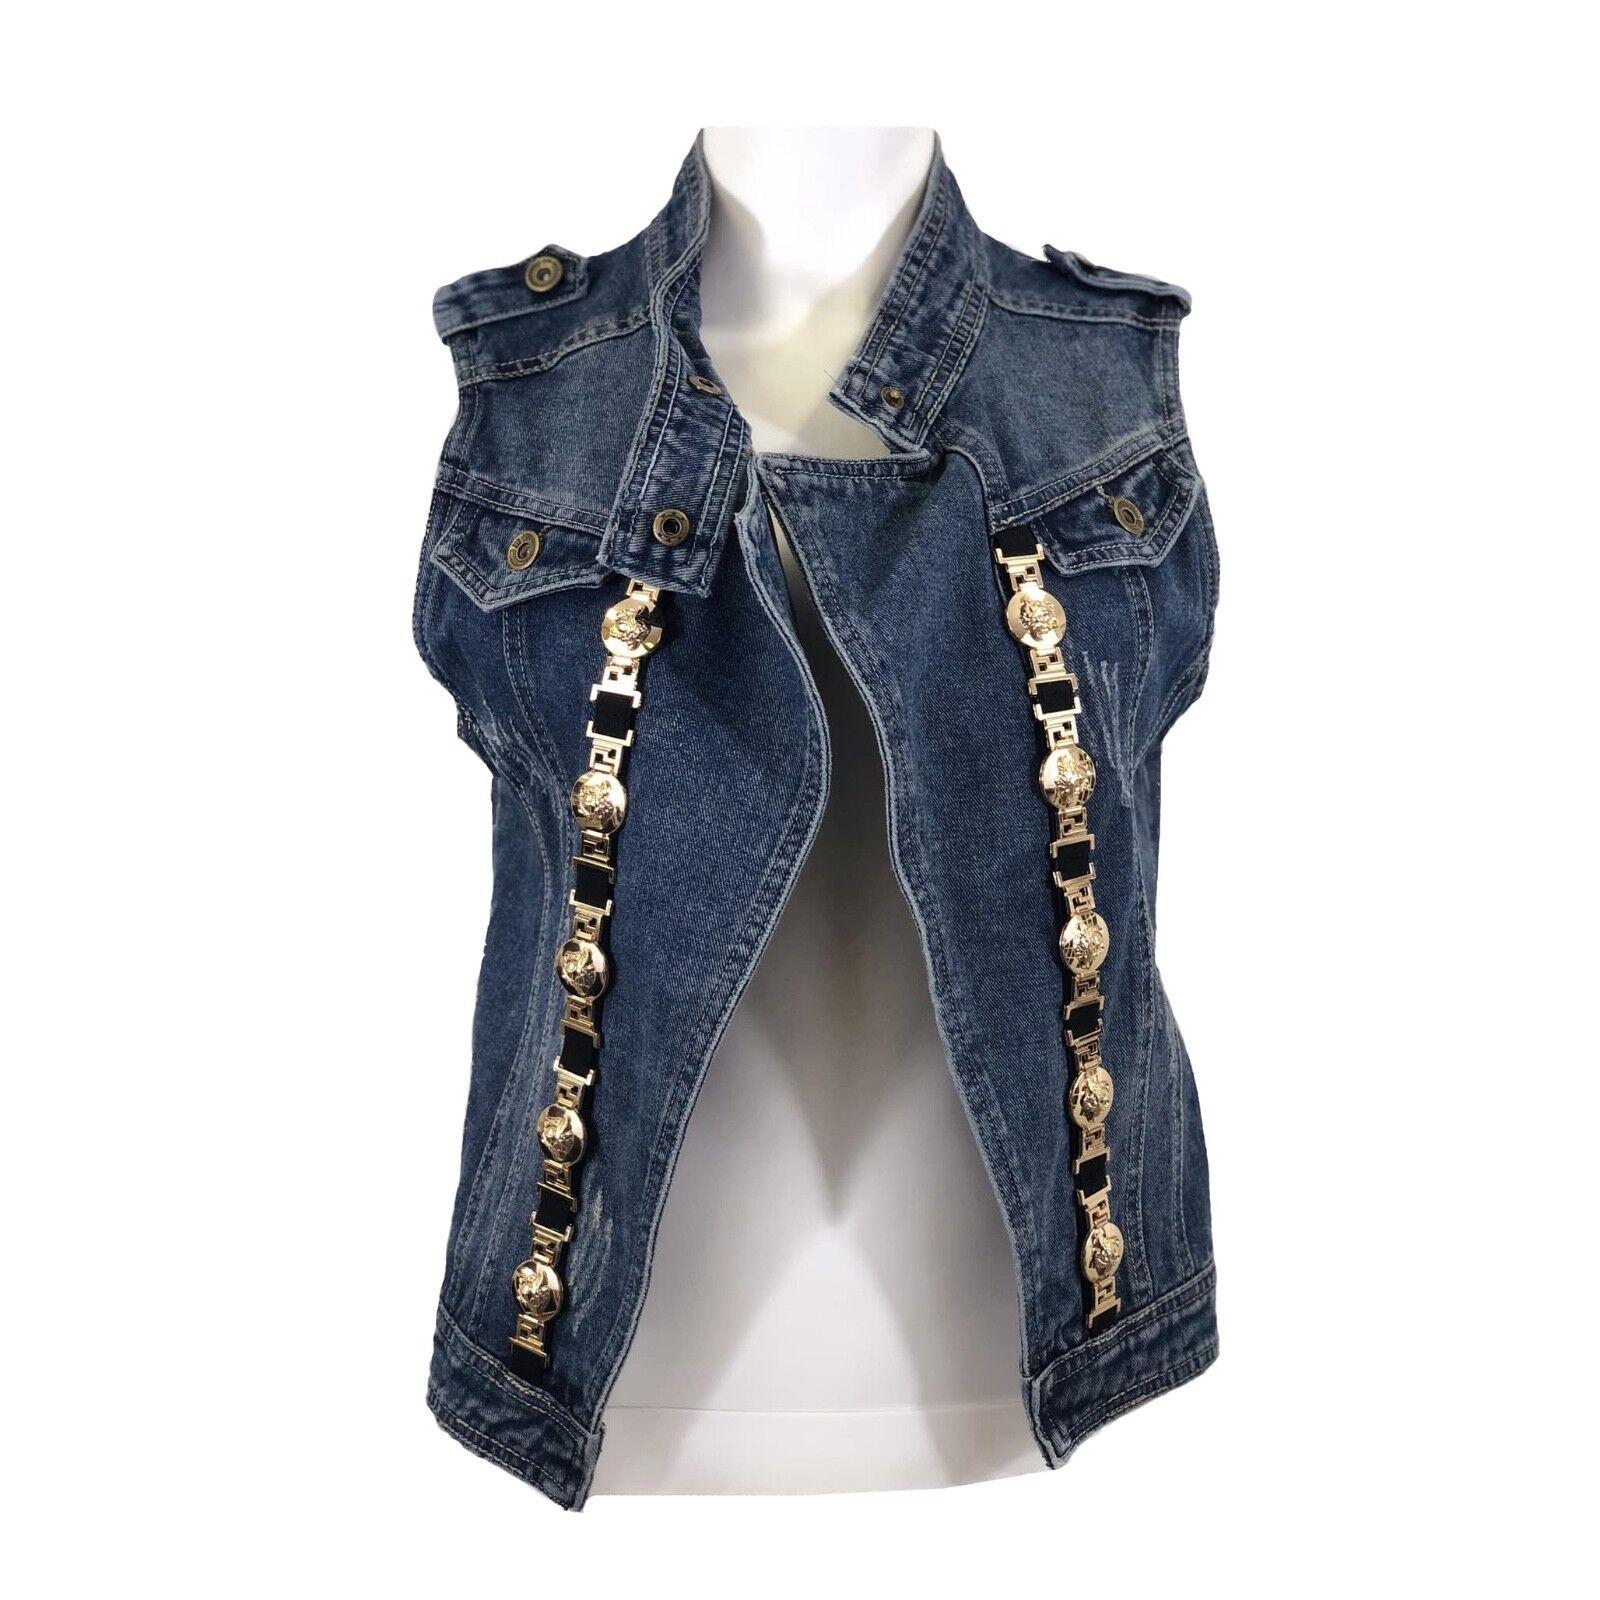 Versace Style Lionhead Medallion Open Front bluee Jean Denim Vest Size Medium